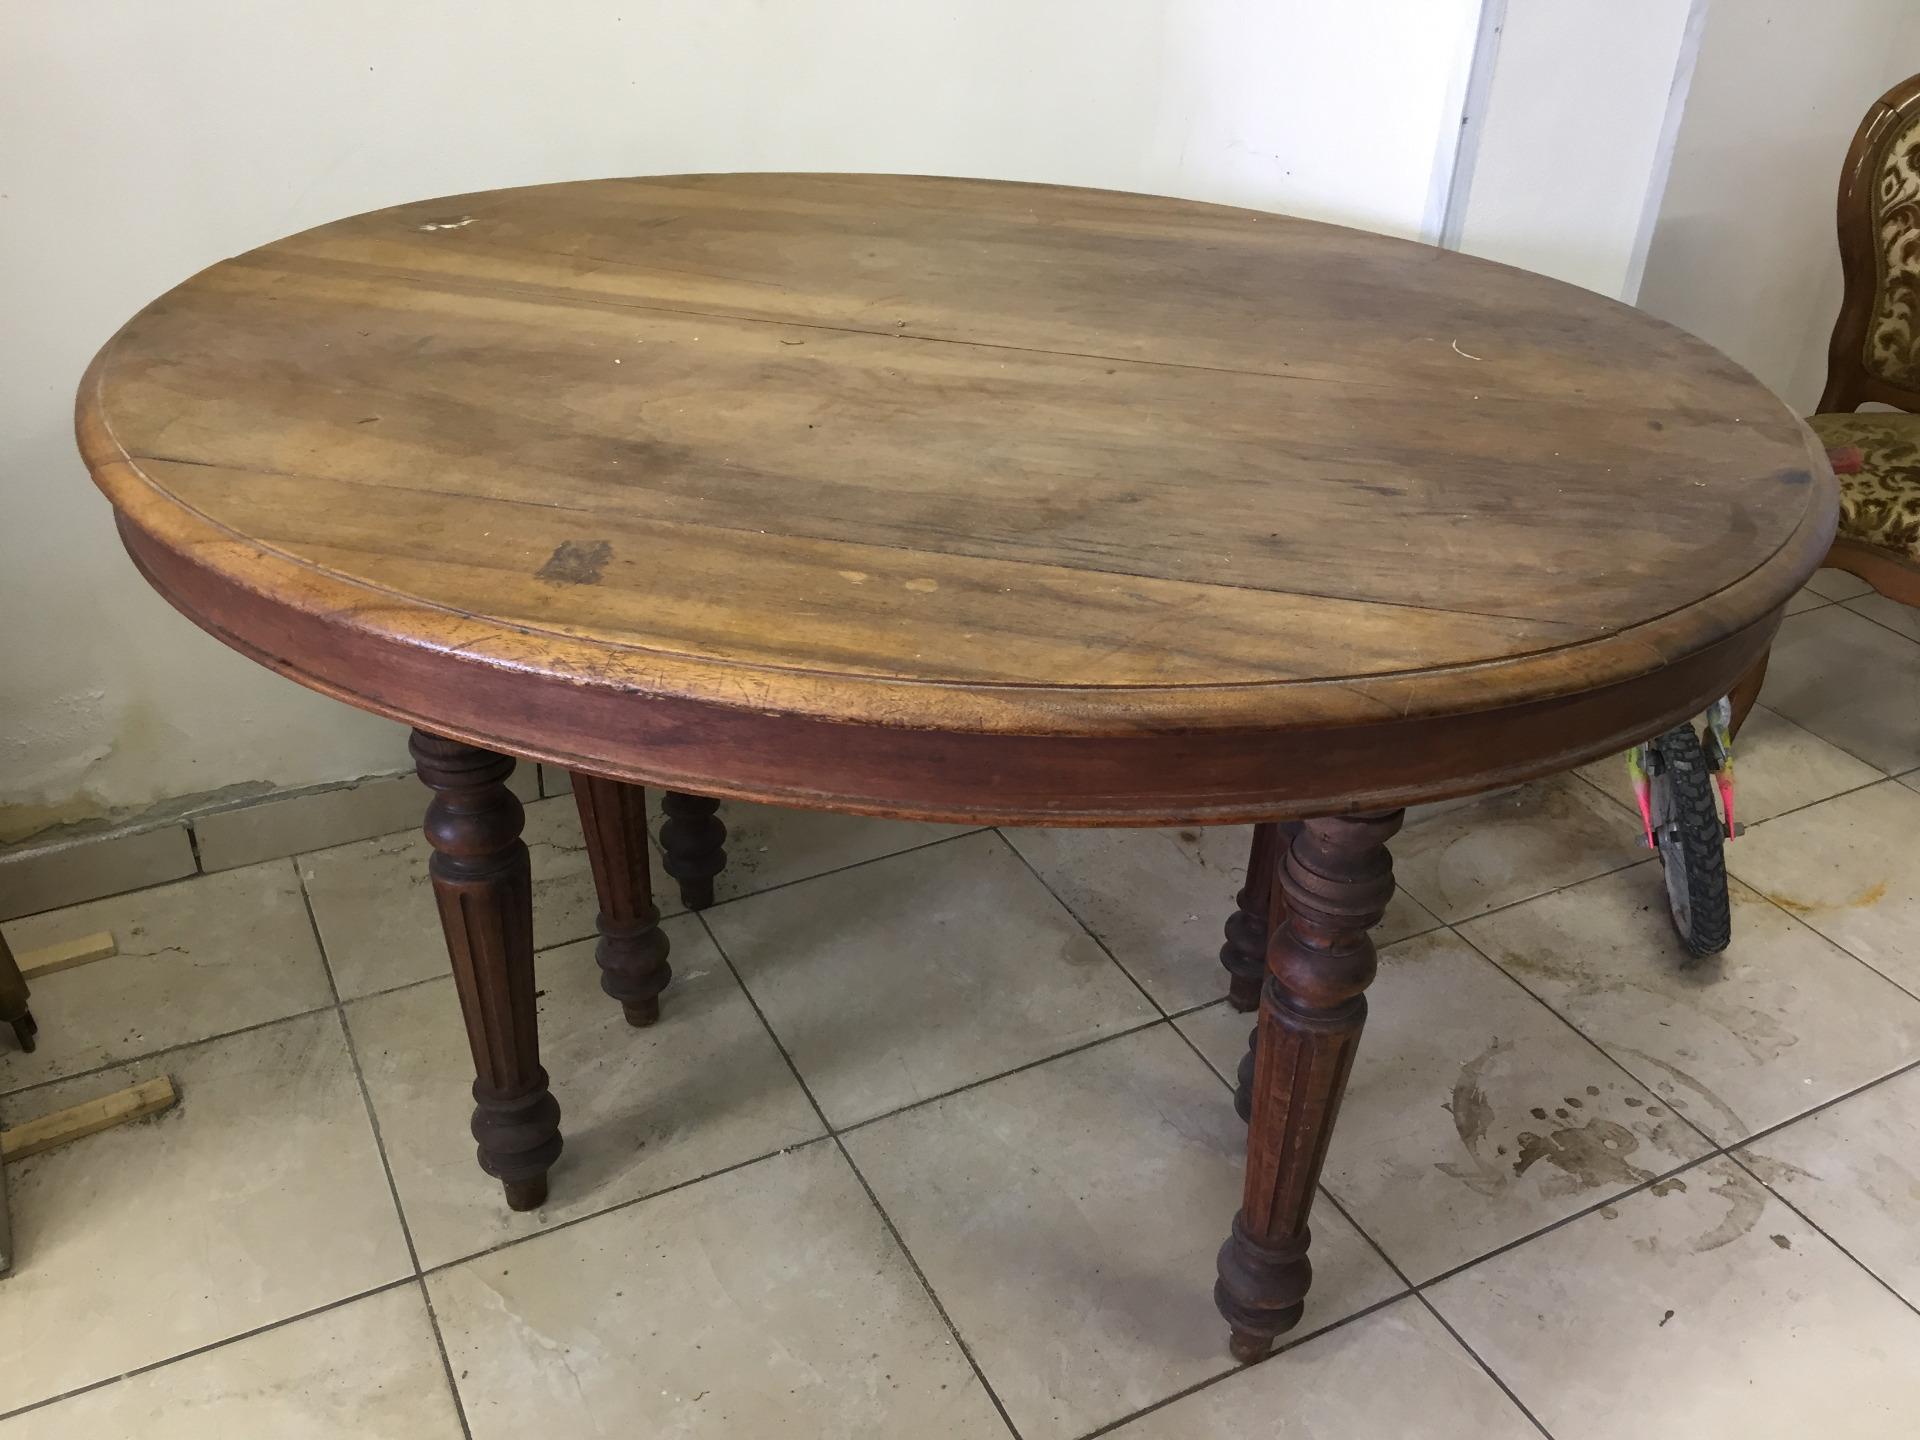 Tavolo Ovale Antico : Tavolo ovale allungabile in noce massello epoca 1880 luigi